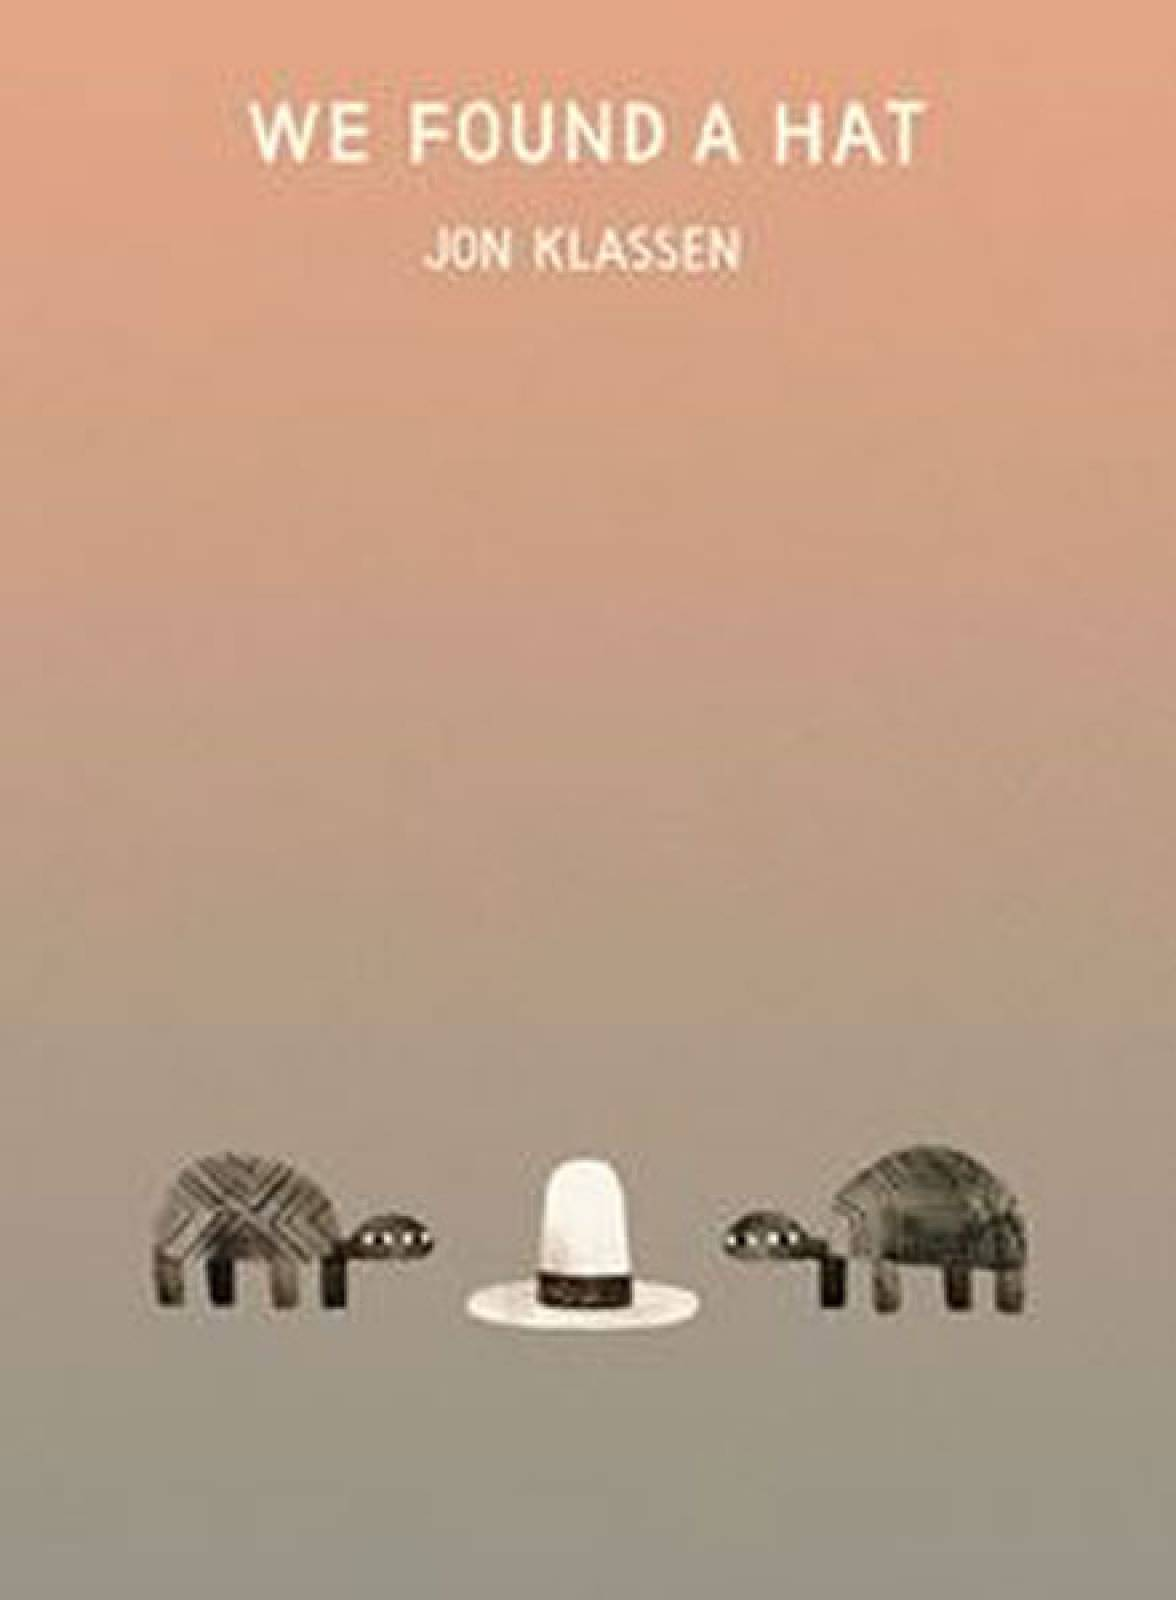 We Found A Hat By Jon Klassen - Hardback Book